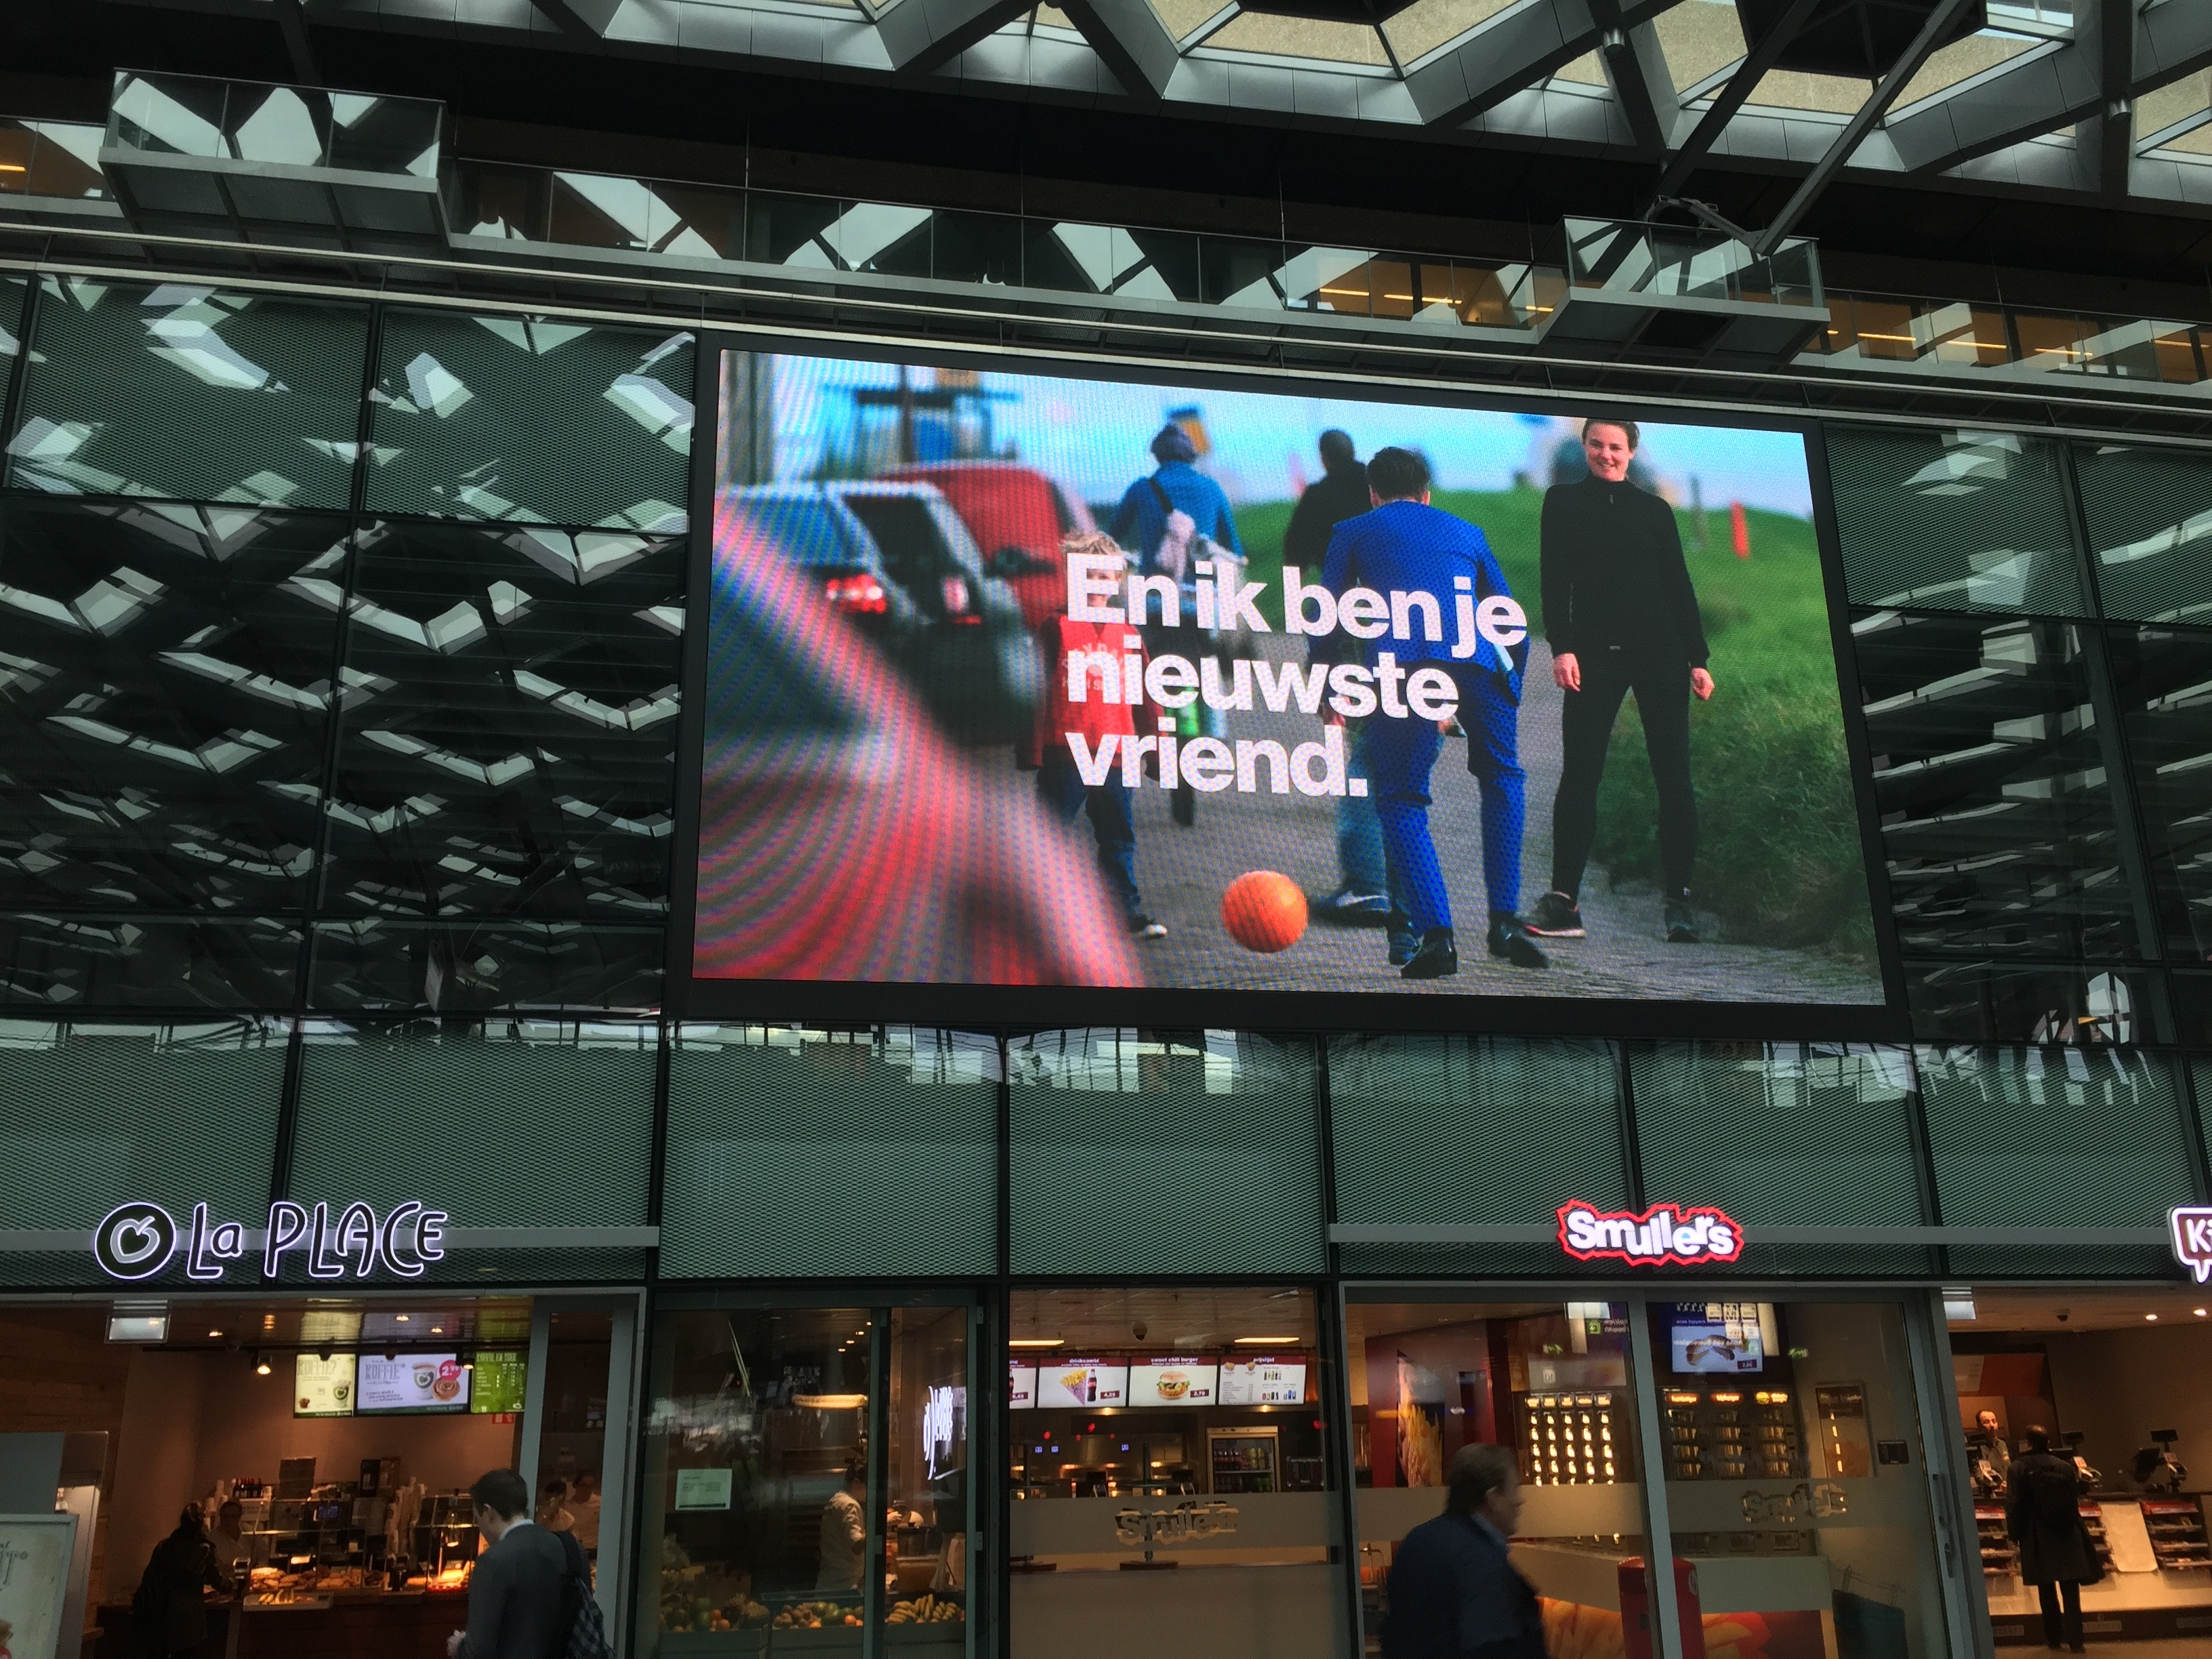 Den Haag CS LED scherm LED Display